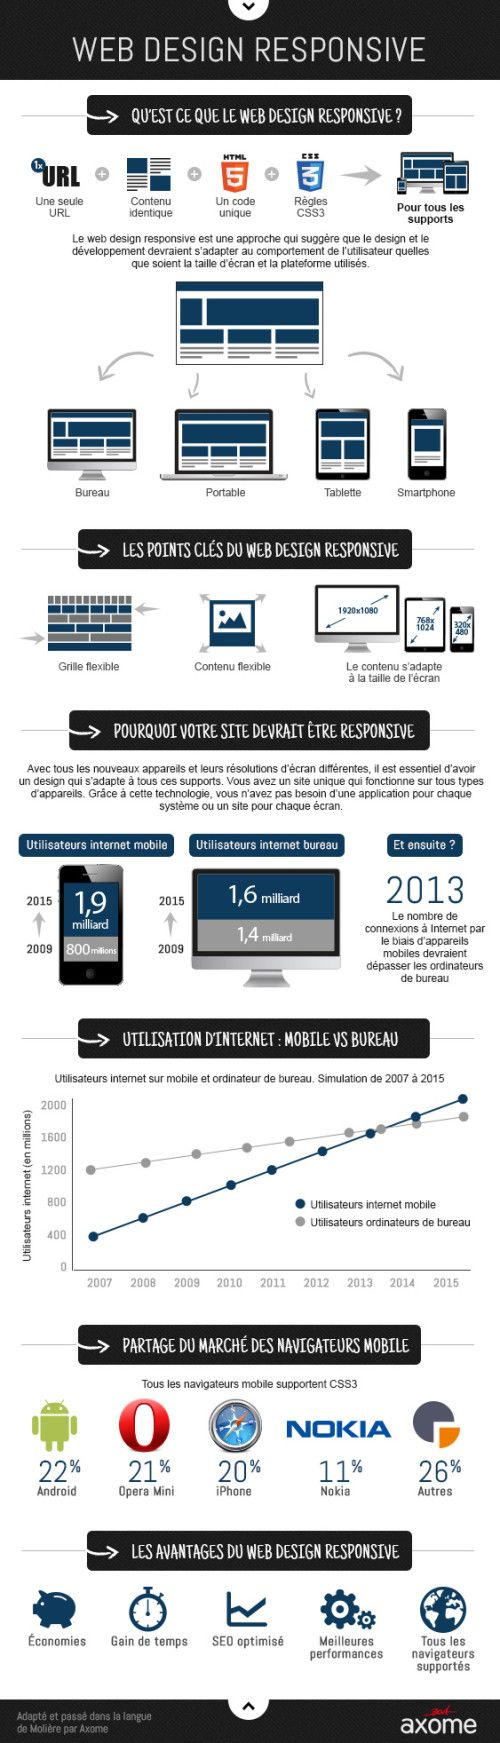 Web Responsive Design – 2013